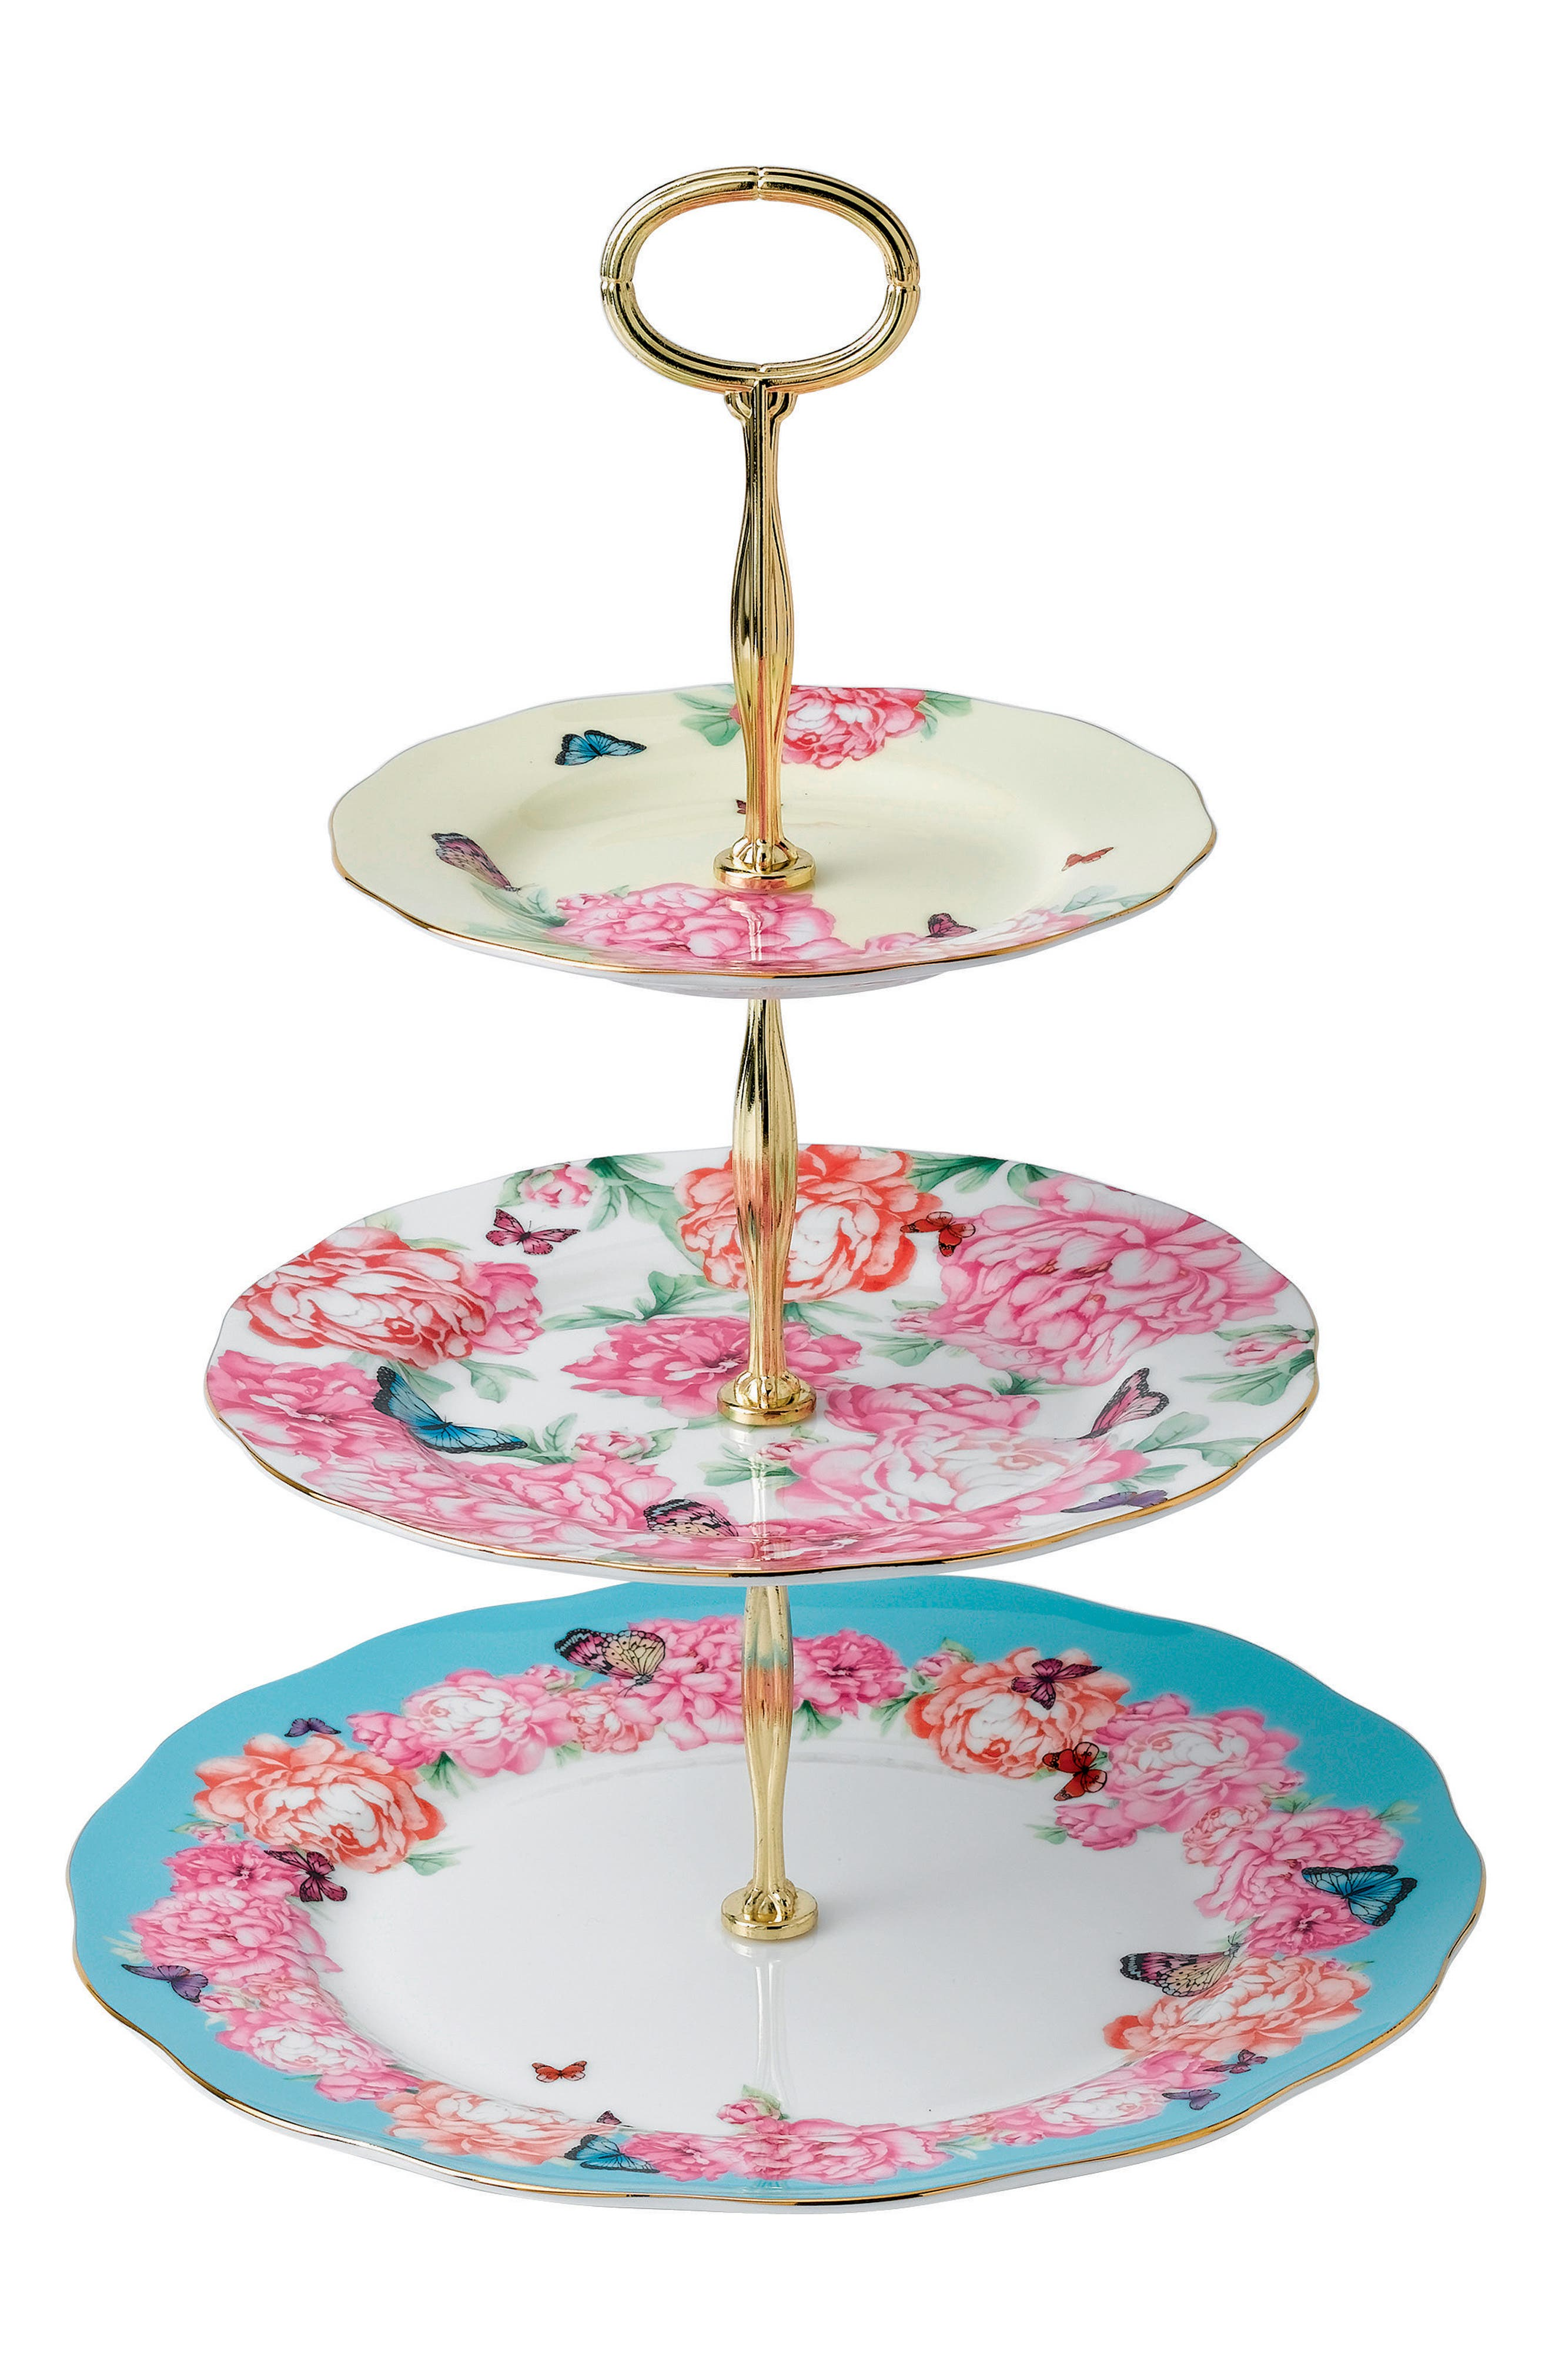 Main Image - Miranda Kerr for Royal Albert Mixed Accents 3-Tier Cake Stand